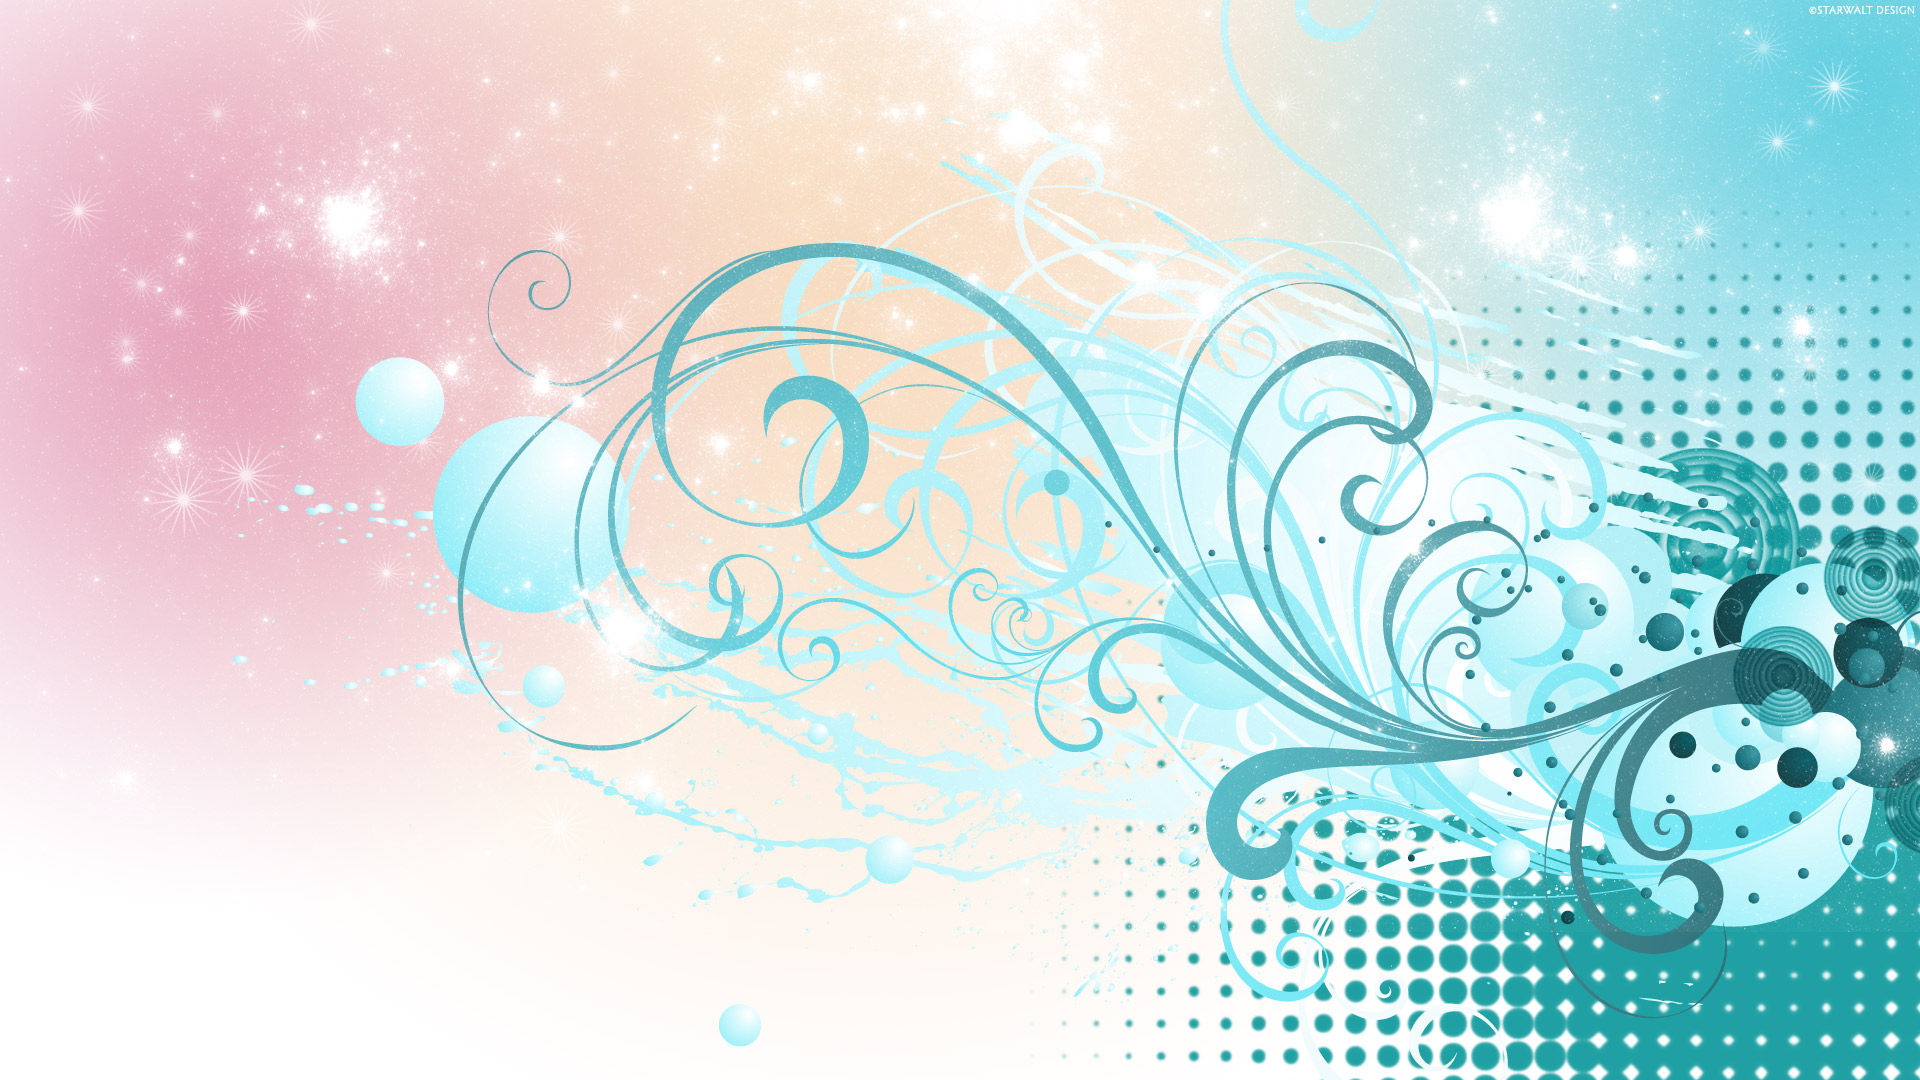 Cool Frame Designs Cute Bright Colorful Backgrounds Wallpaper Wallpapersafari